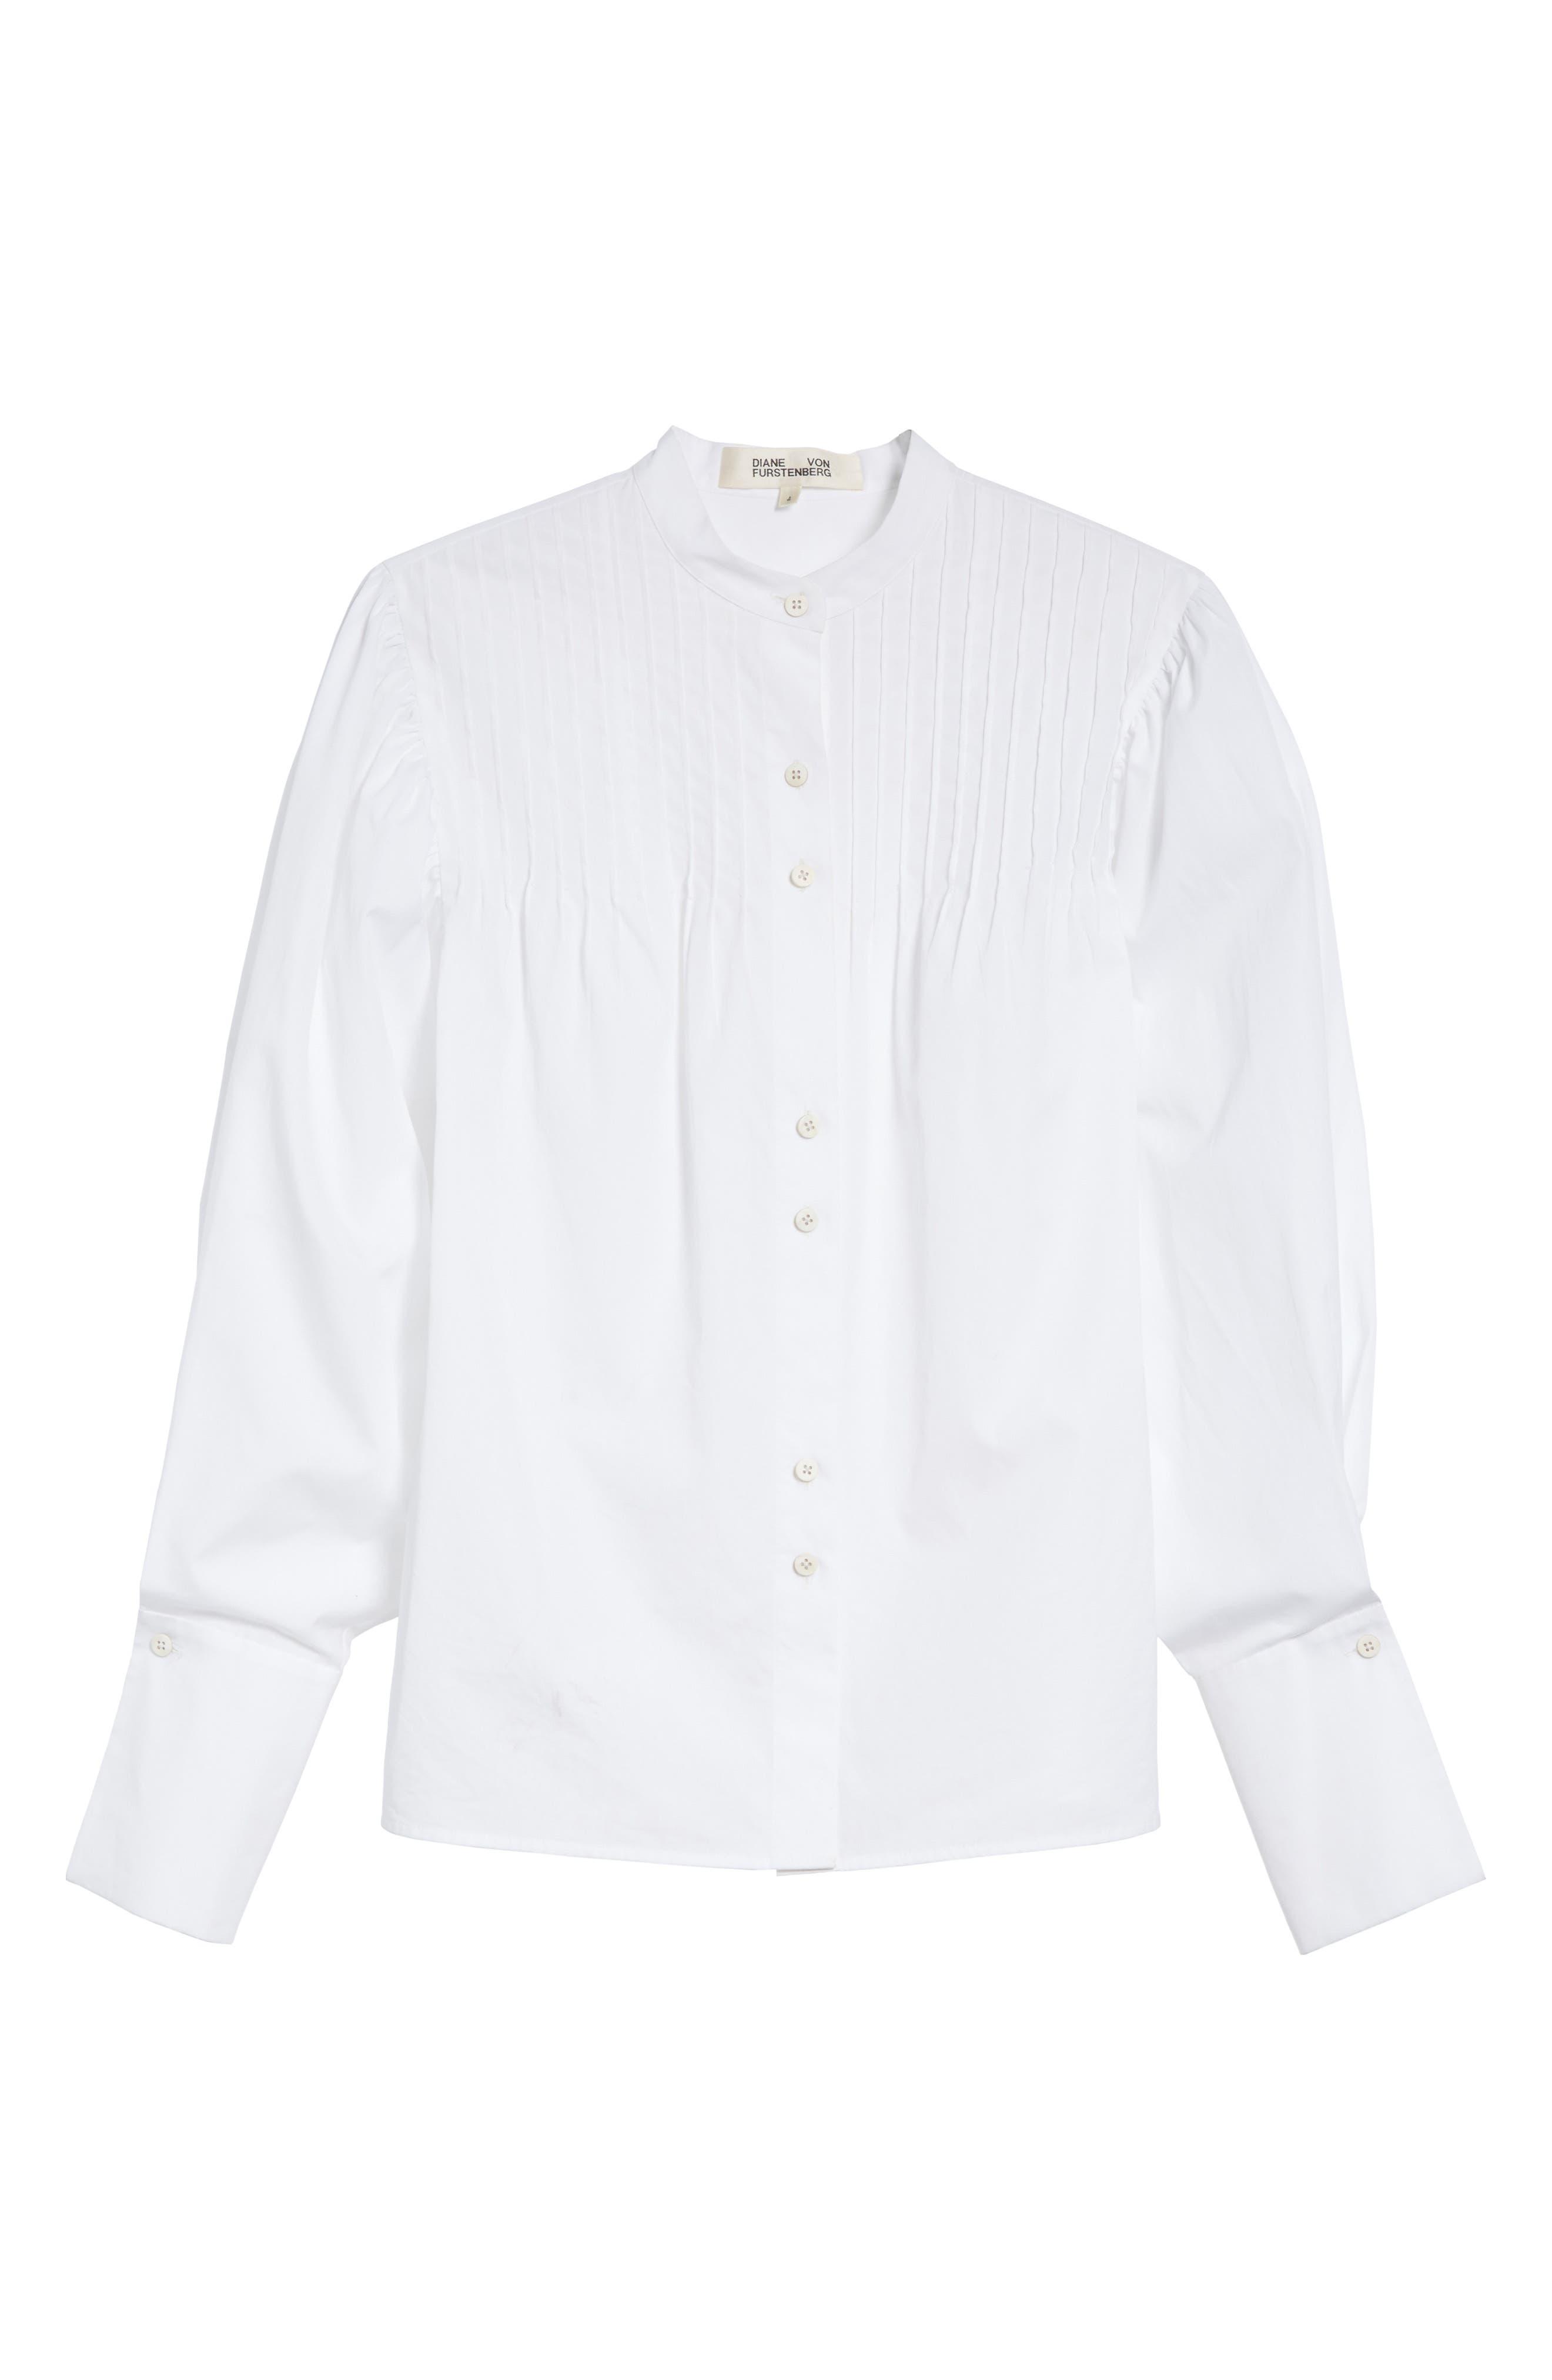 Diane von Furstenberg Pintuck Cotton Blouse,                             Alternate thumbnail 6, color,                             100